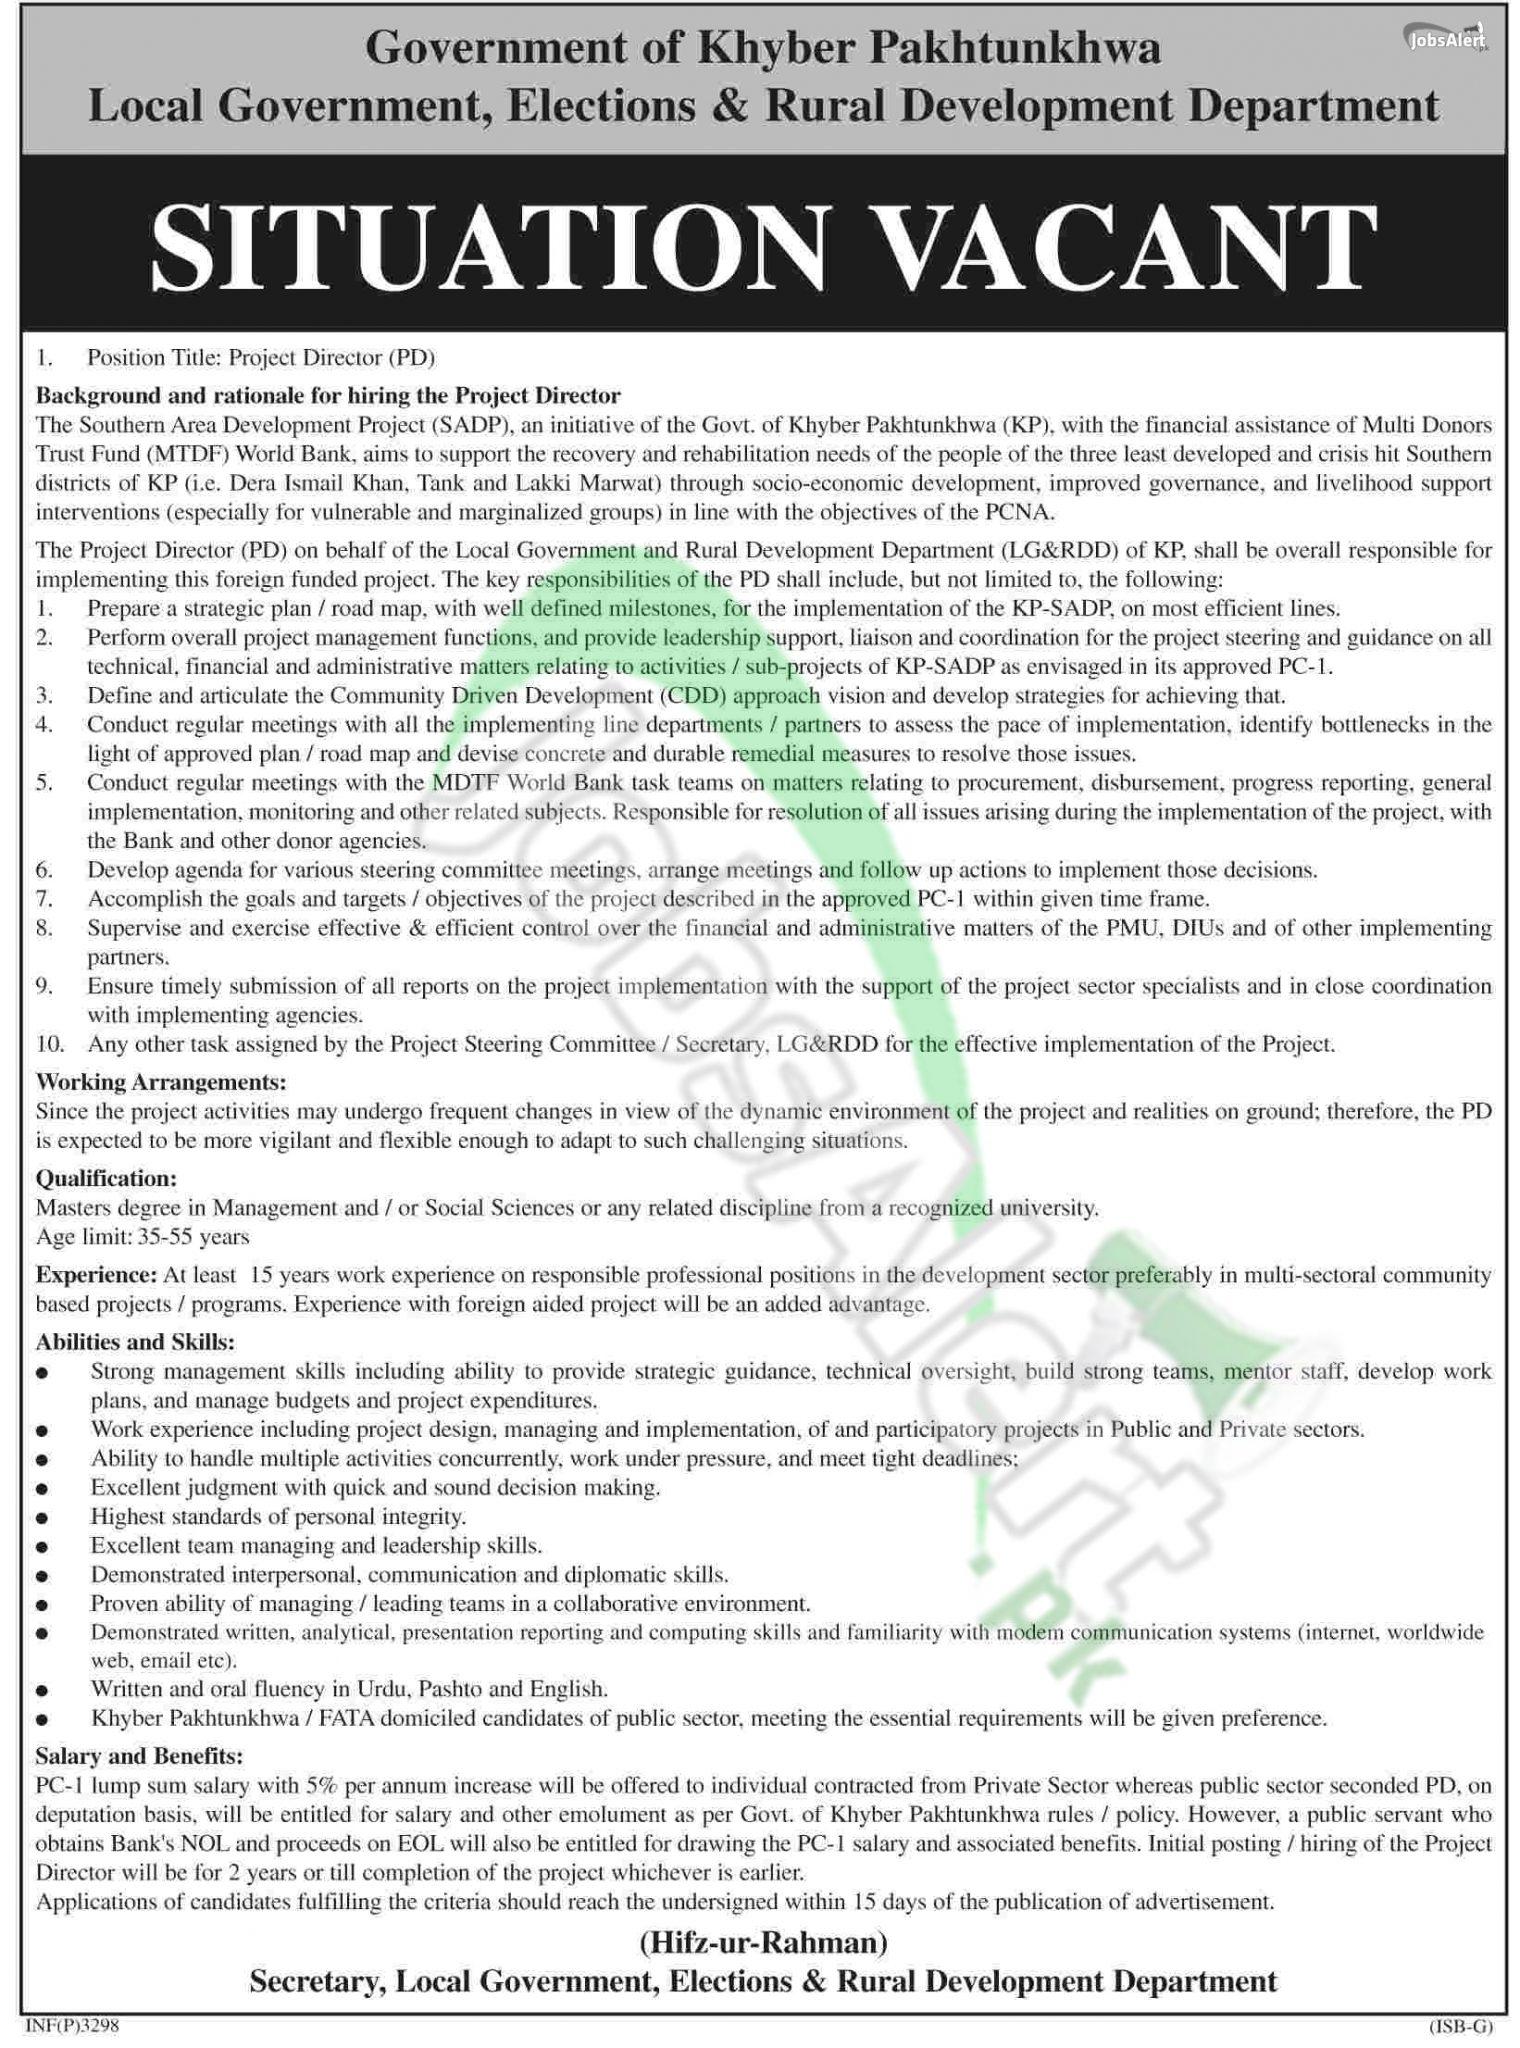 Local Govt, Elections & Rural Development Deptt KPK